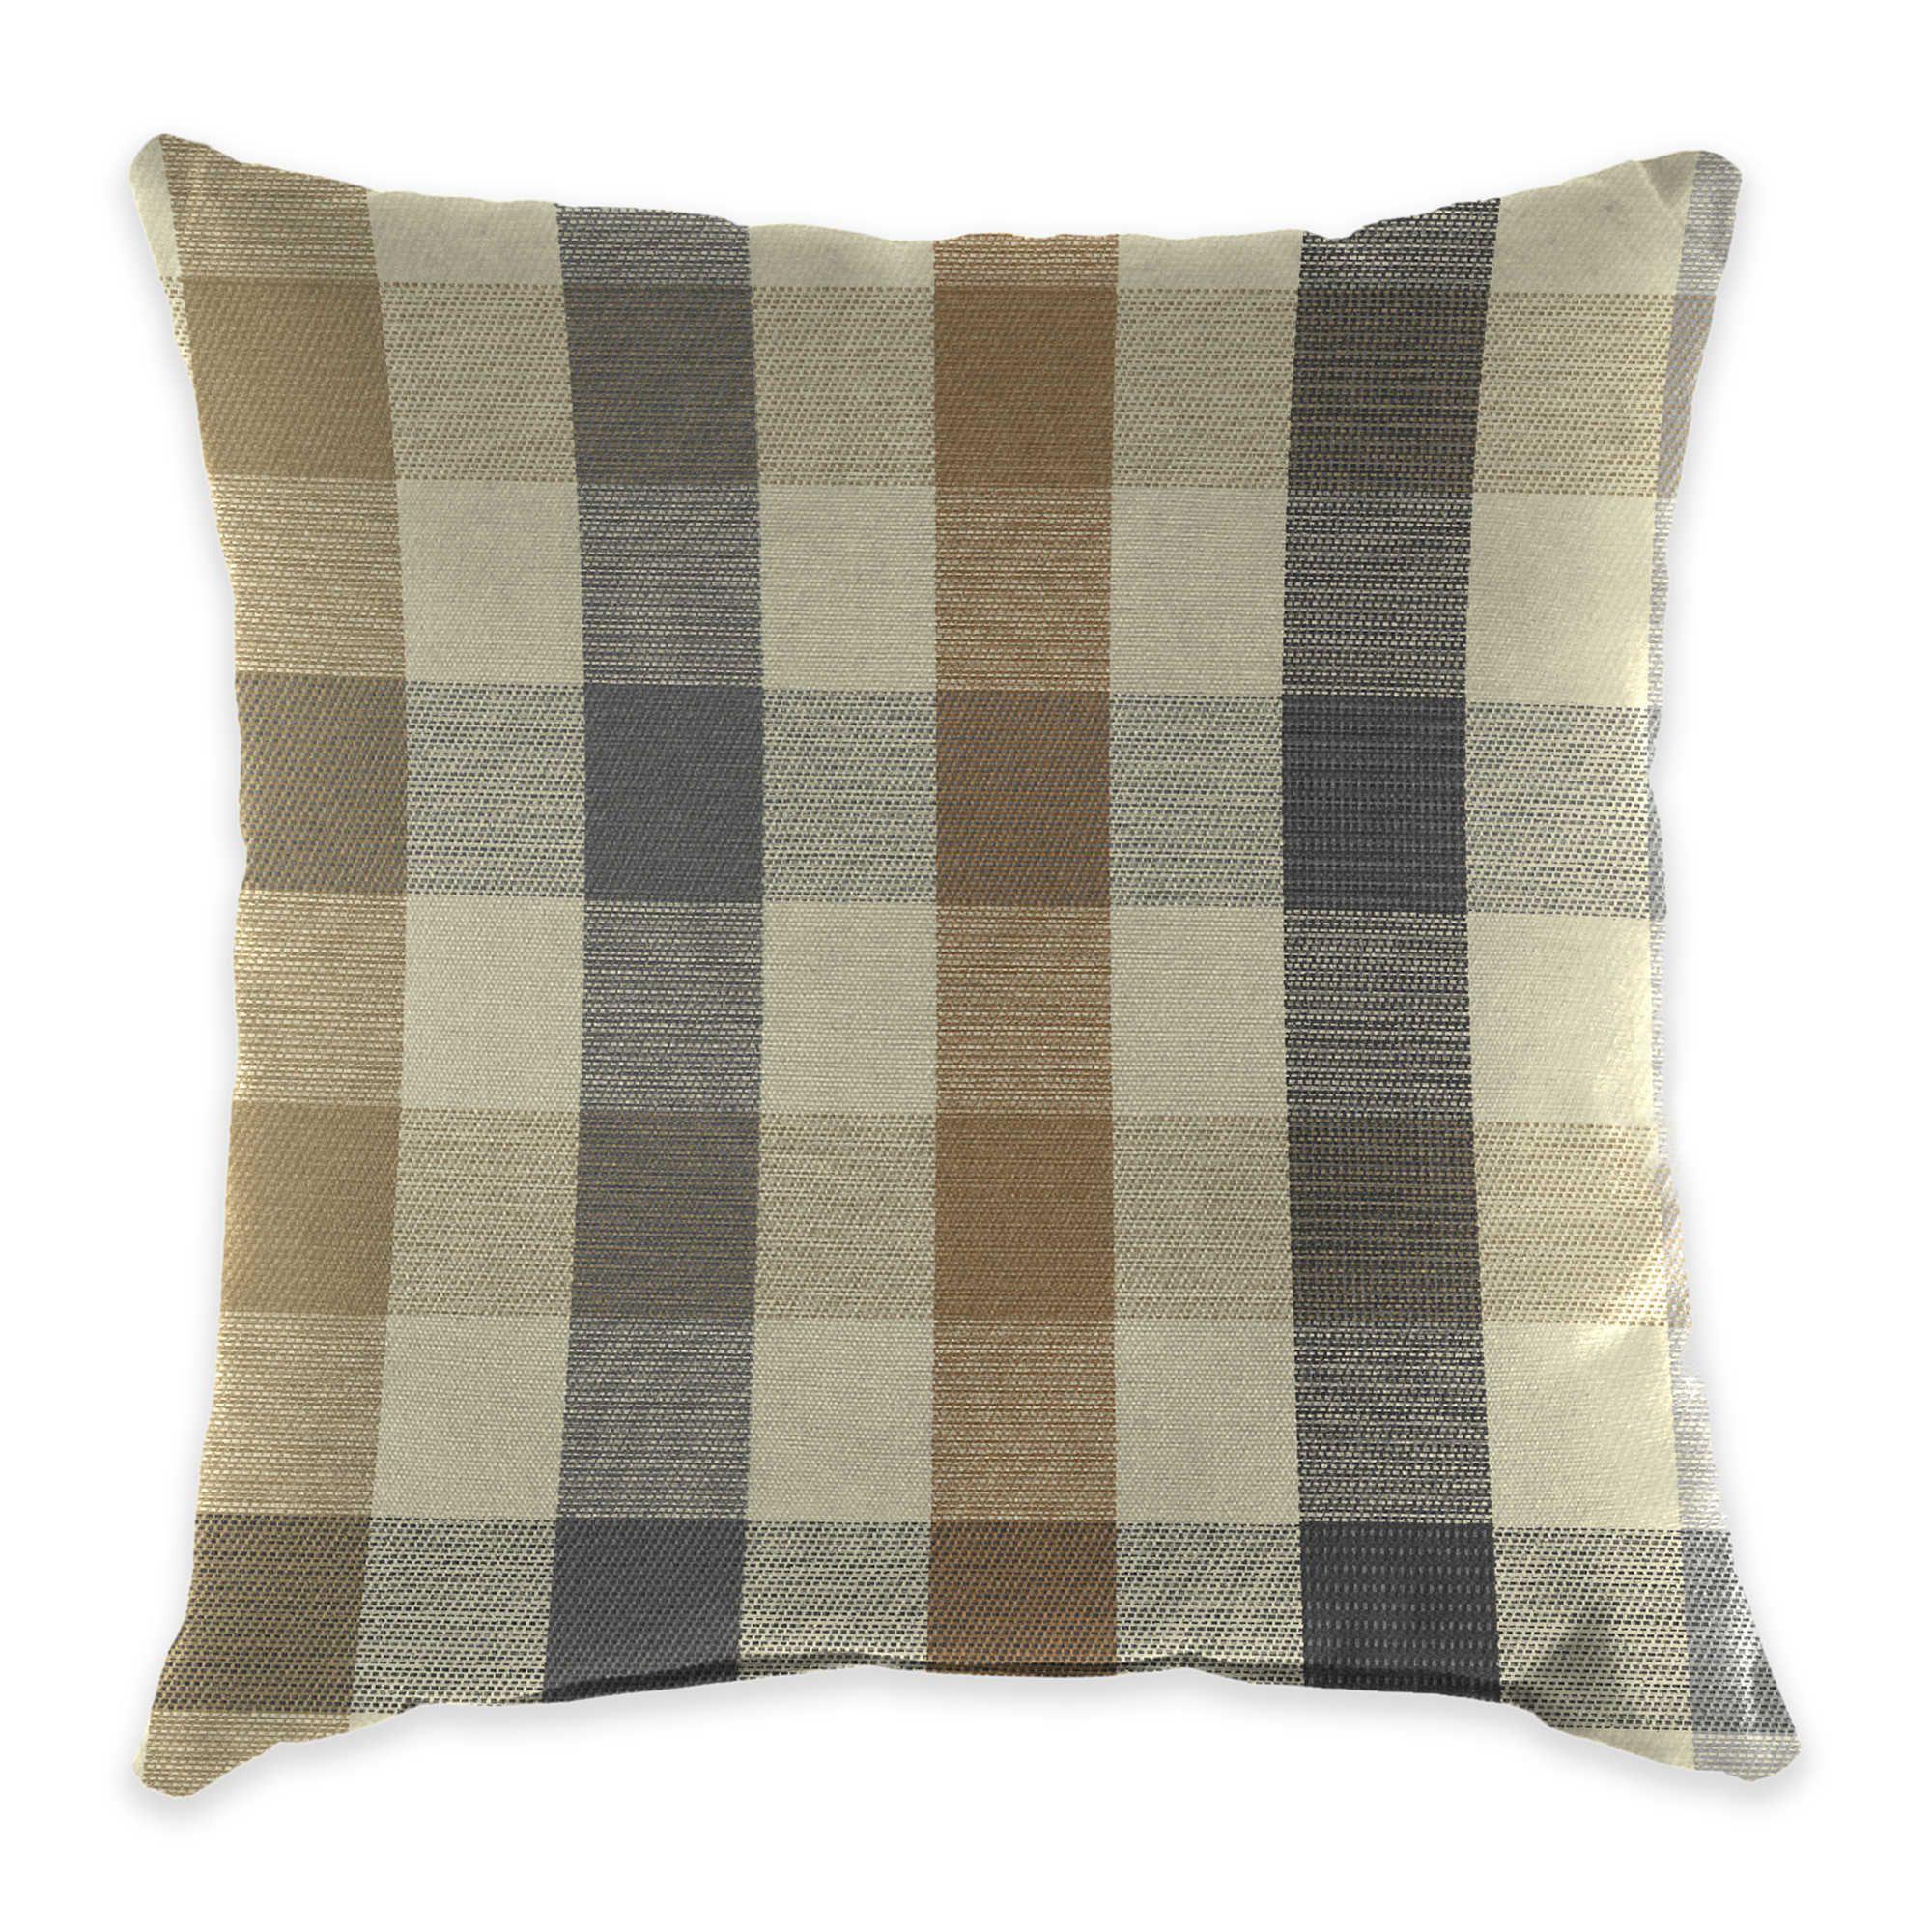 Outdoor Throw Pillow In Sunbrella Connect Dune Sunbrella Pillows Throw Pillows Outdoor Throw Pillows